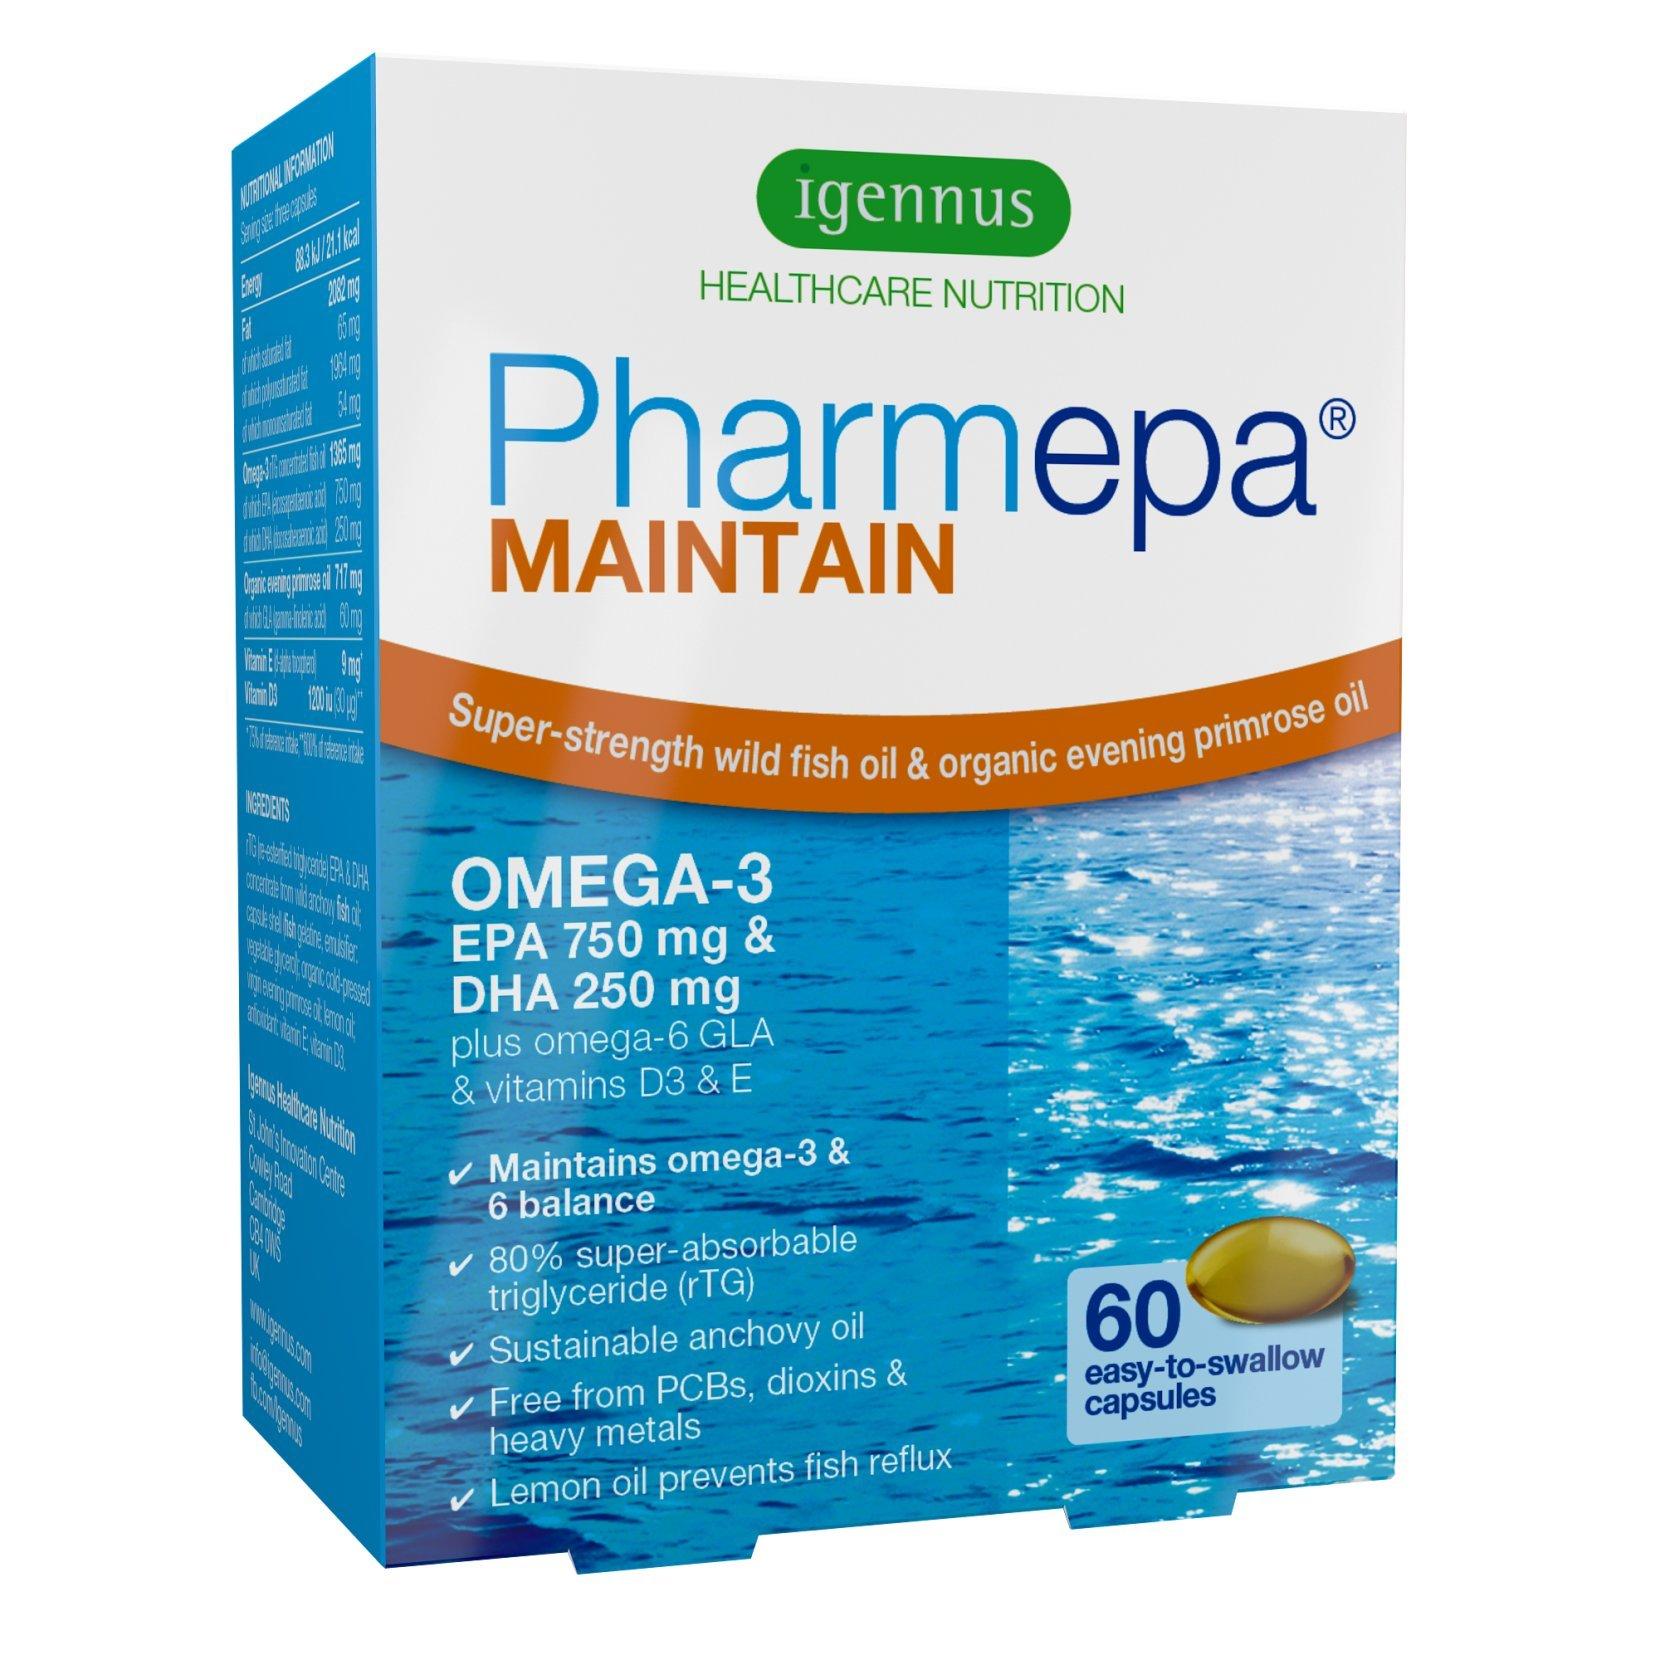 Pharmepa Maintain EPA DHA Omega-3 Fish Oil & D3, 750/250 per Serving, Odorless, 60 Small softgels by Igennus Healthcare Nutrition